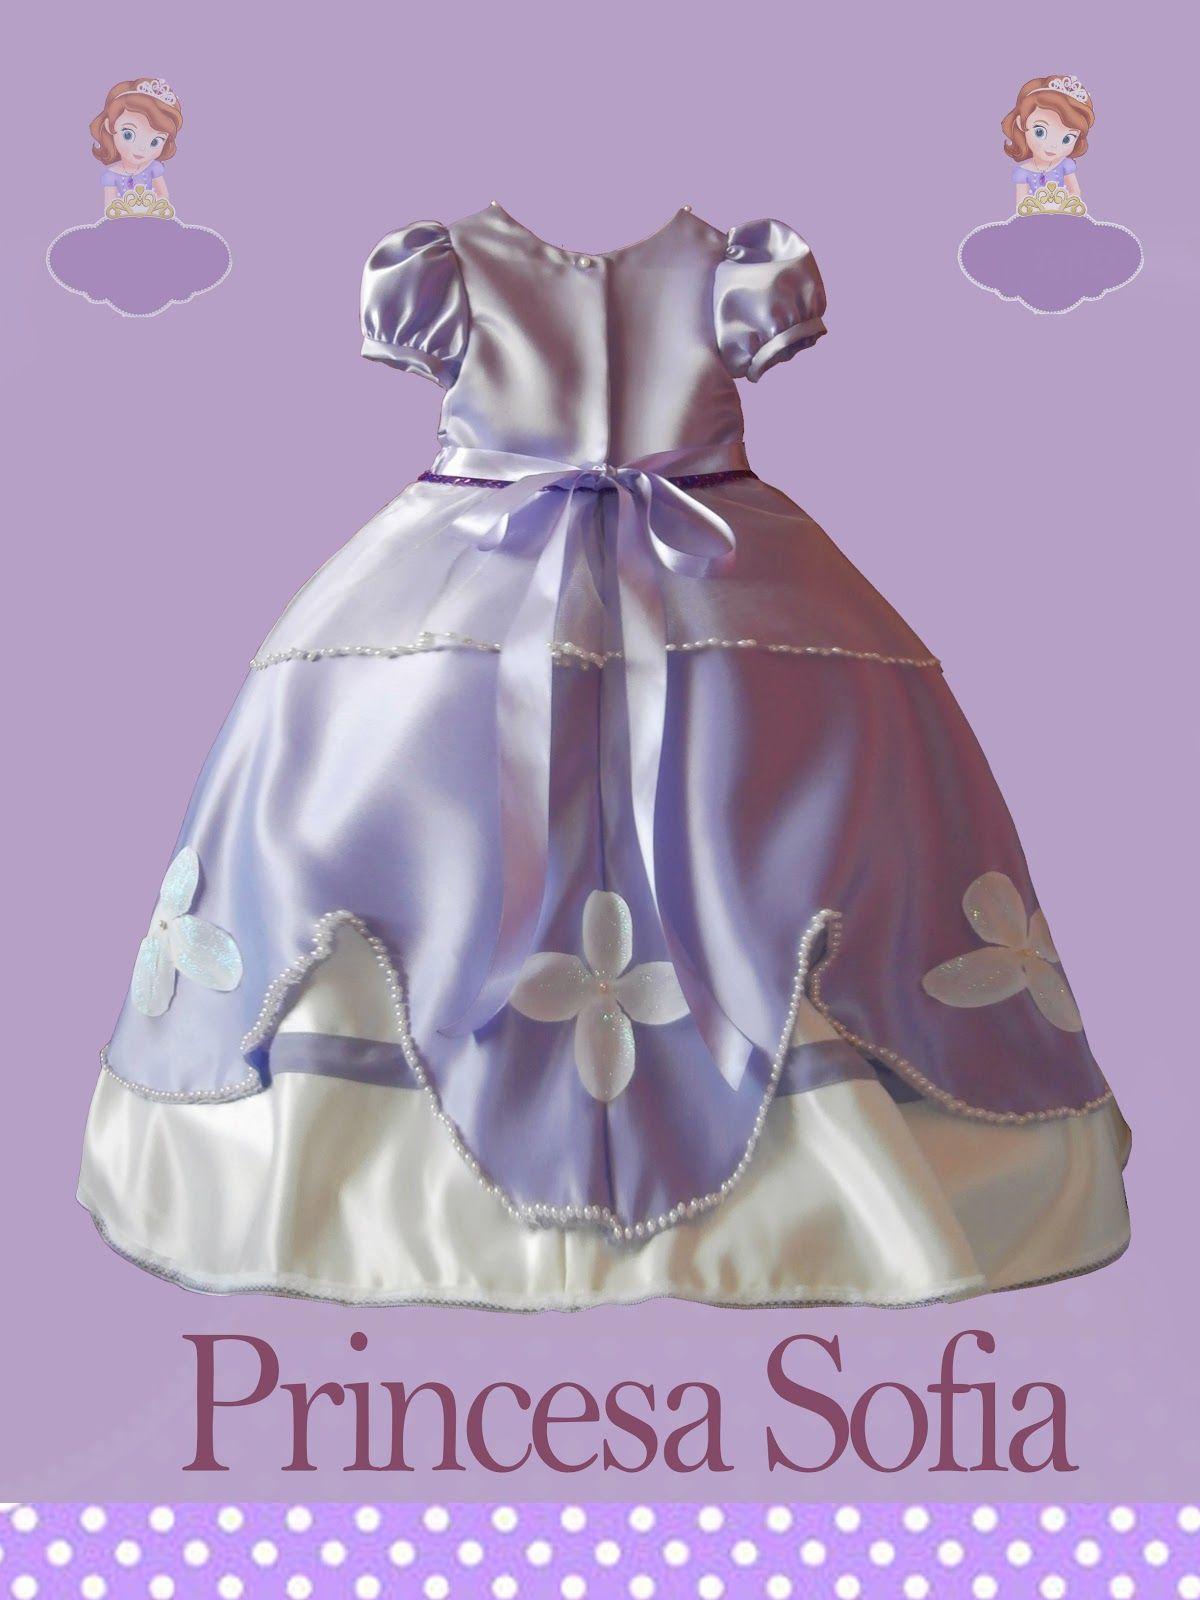 P2030464a.jpg (1200×1600) | princesa sofia | Pinterest | Princesa ...